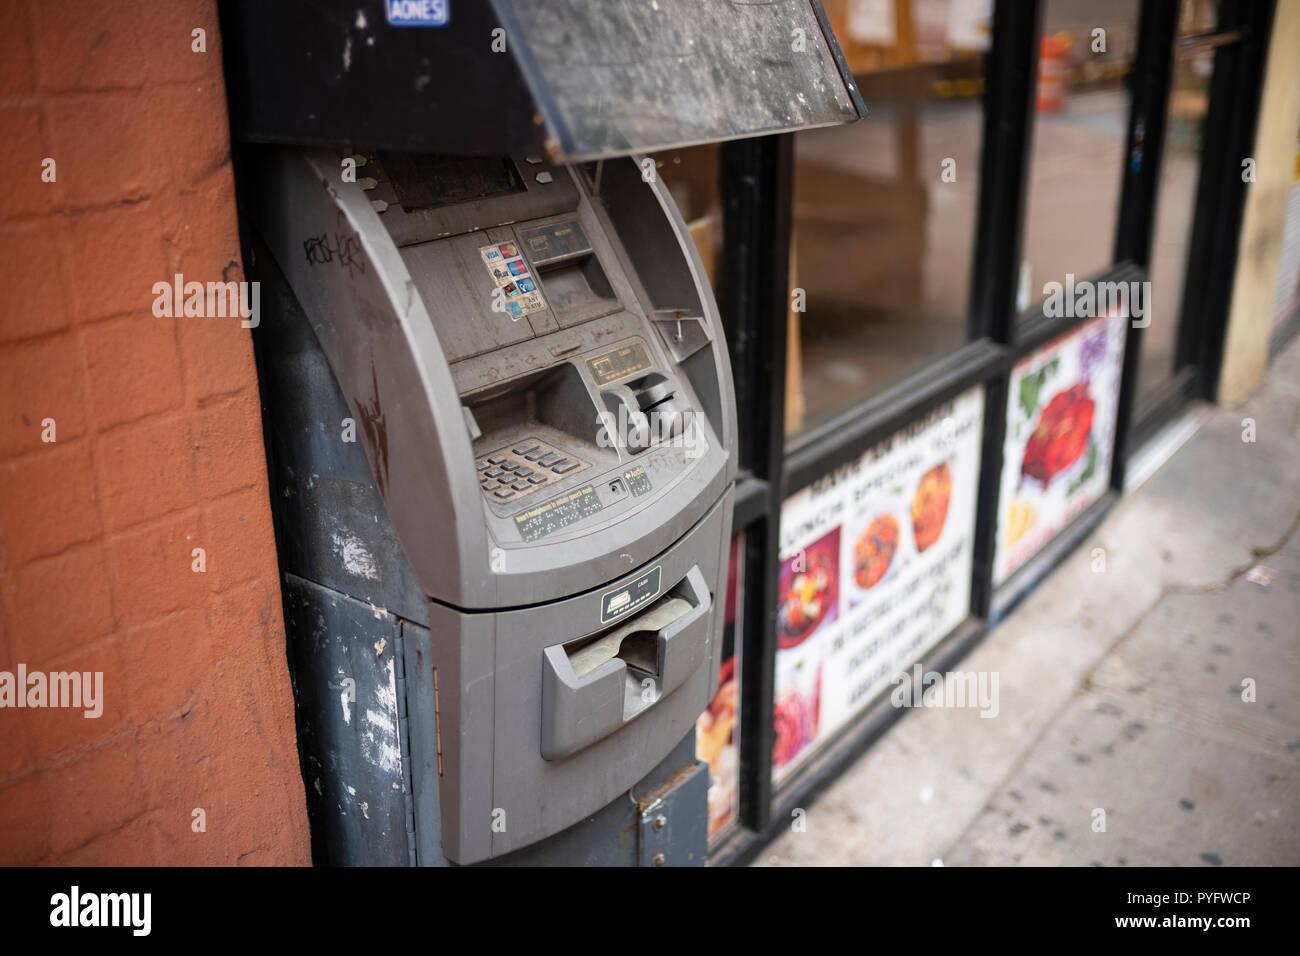 L'argent comptant est-il mort? Une ancienne machine ATM, Hell's Kitchen, New York City, New York. Photo Stock